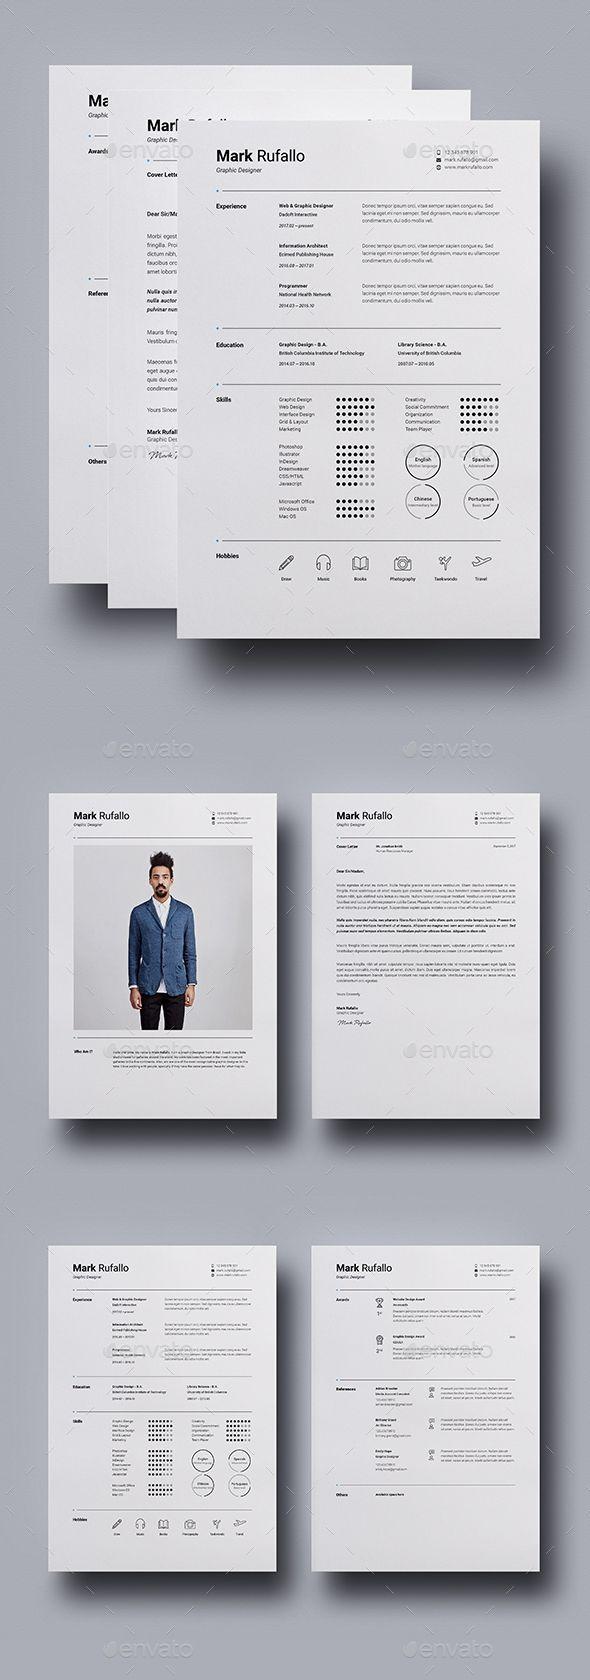 Resume/CV Template   Cv template, Resume cv and Template